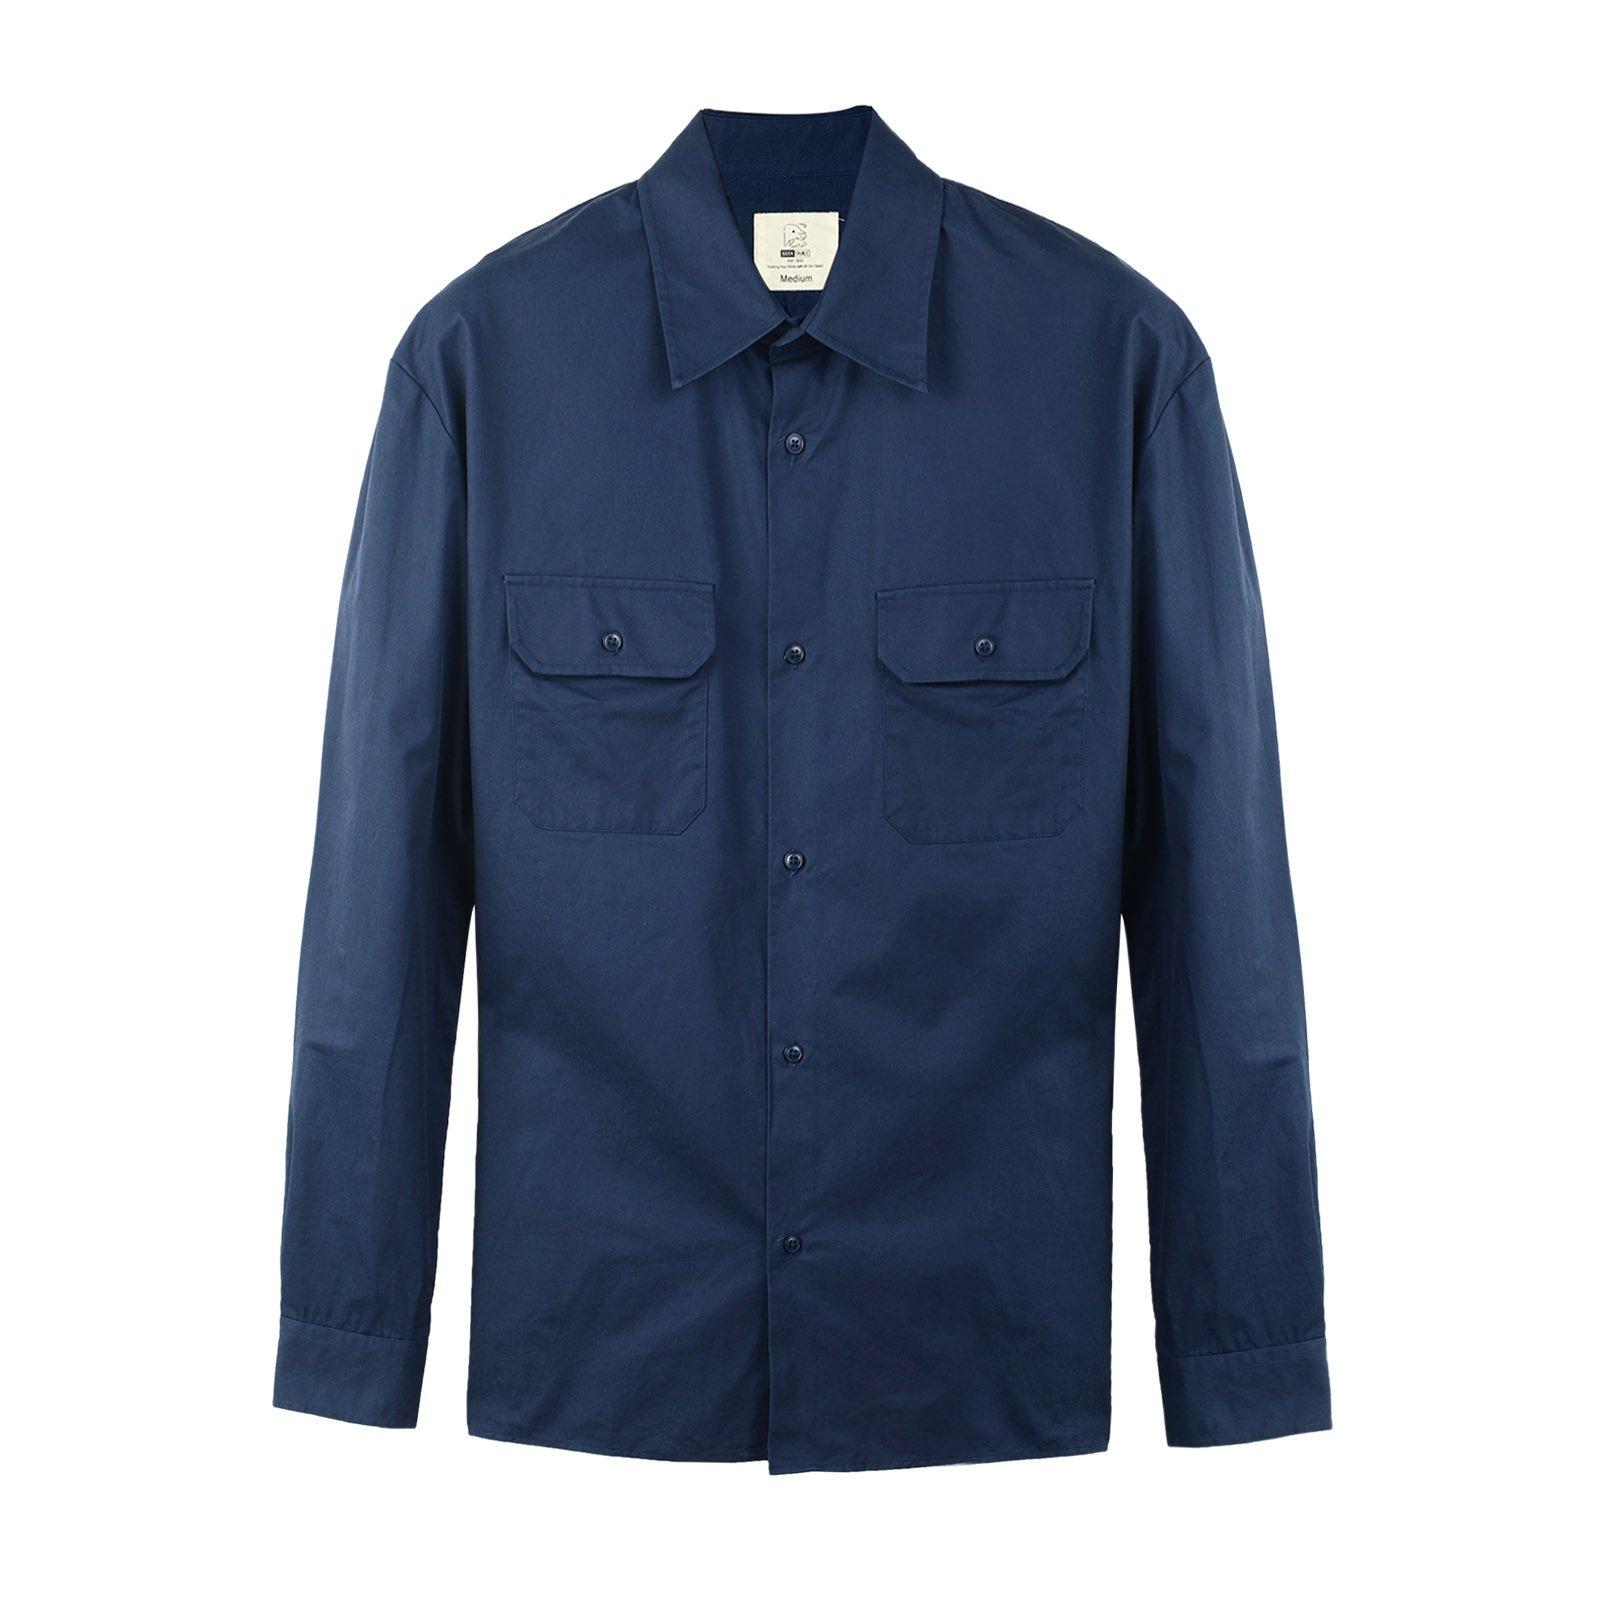 Seeksmile Men's Long Sleeve Cotton Work Shirt (Large, Navy Blue)